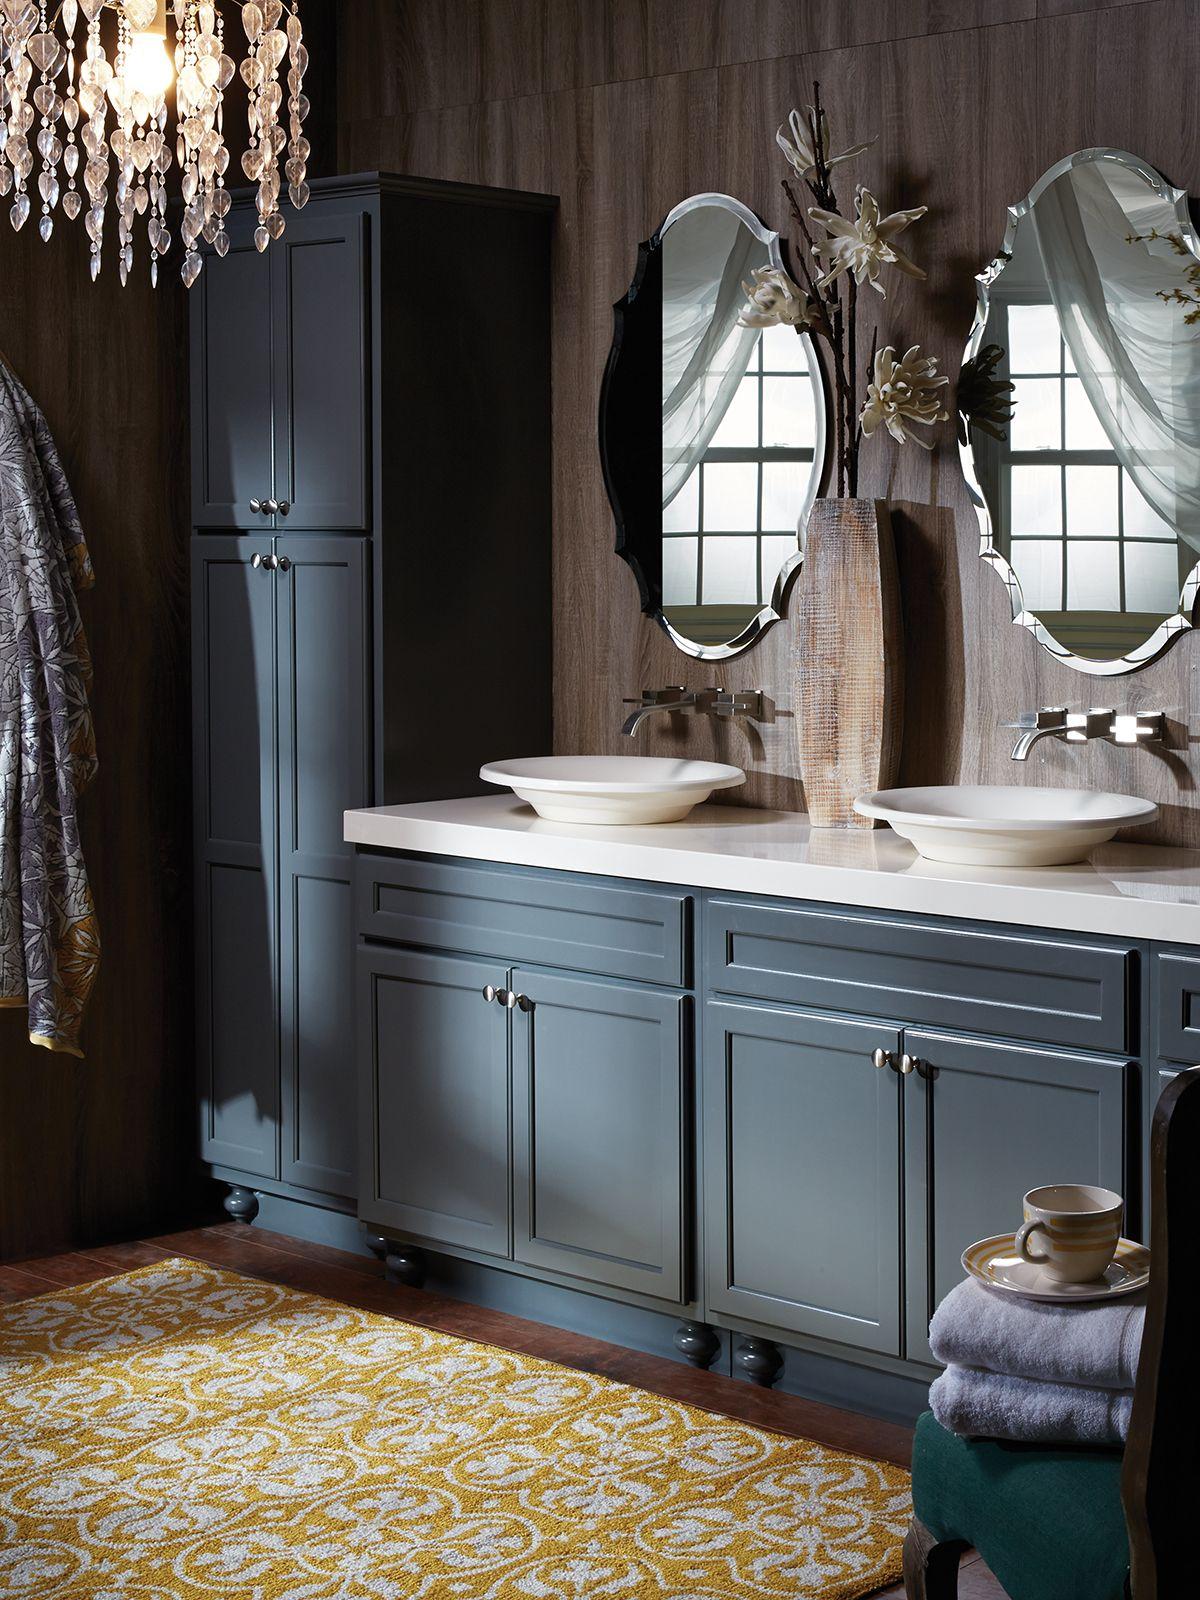 Northbrook Birch Graphite Small Bathroom Cabinets Kitchen Cabinets In Bathroom Bertch Cabinets